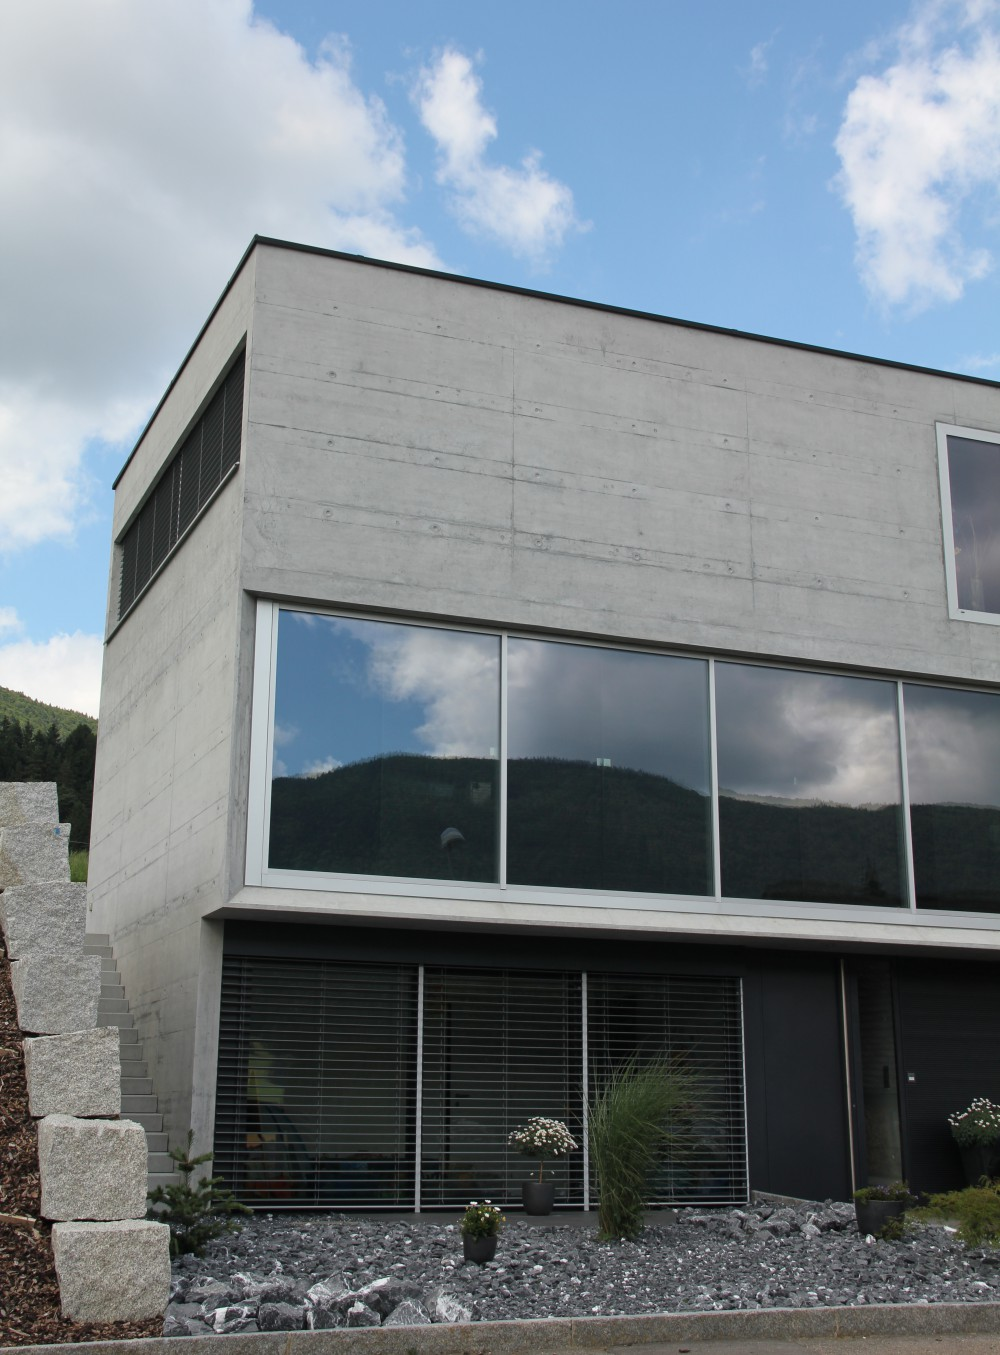 Villa-a-malleray-53-1407-4